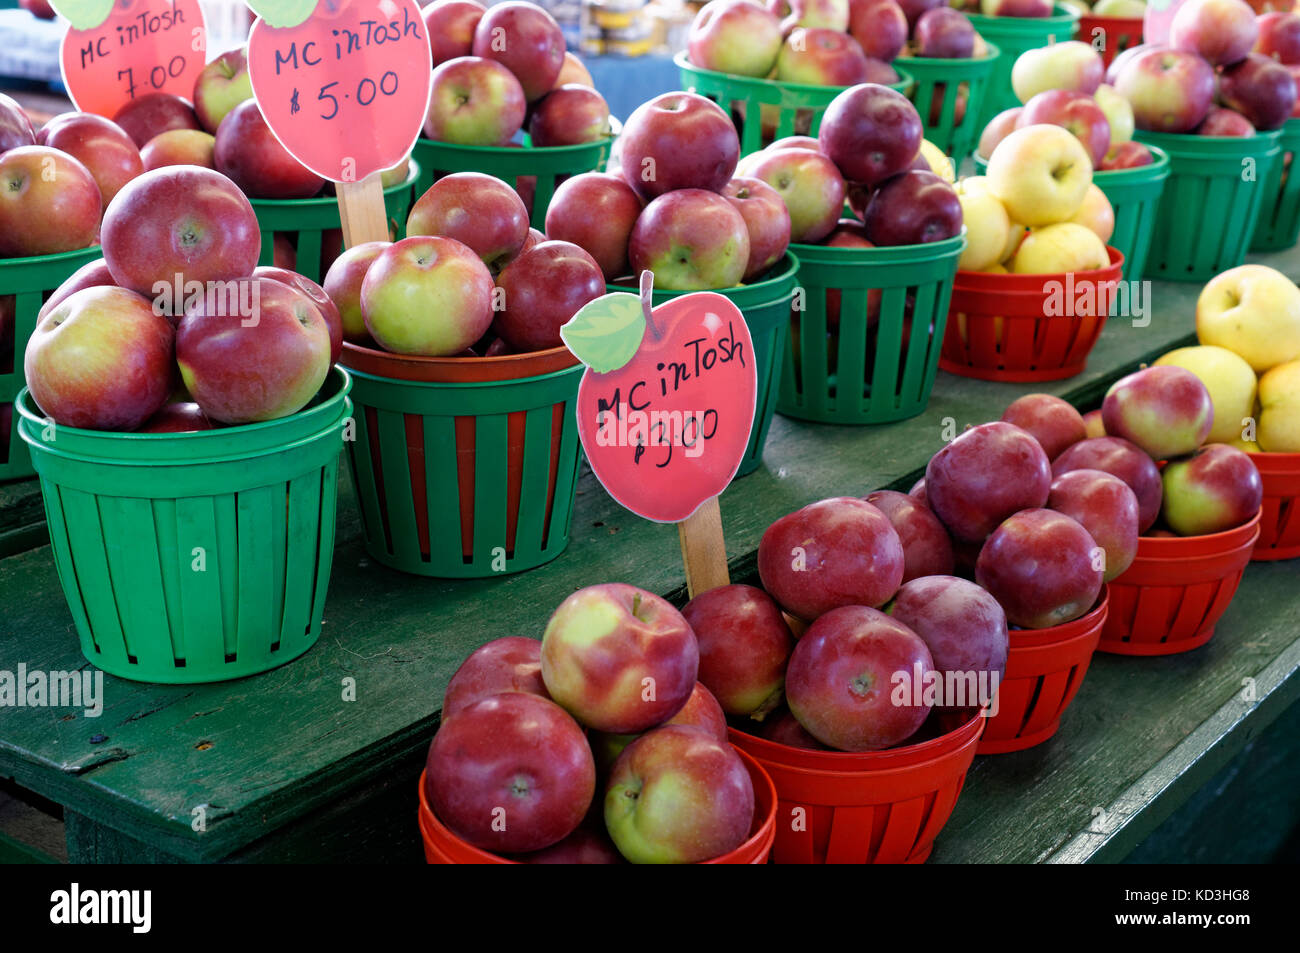 baskets-of-fresh-quebec-grown-mcintosh-a